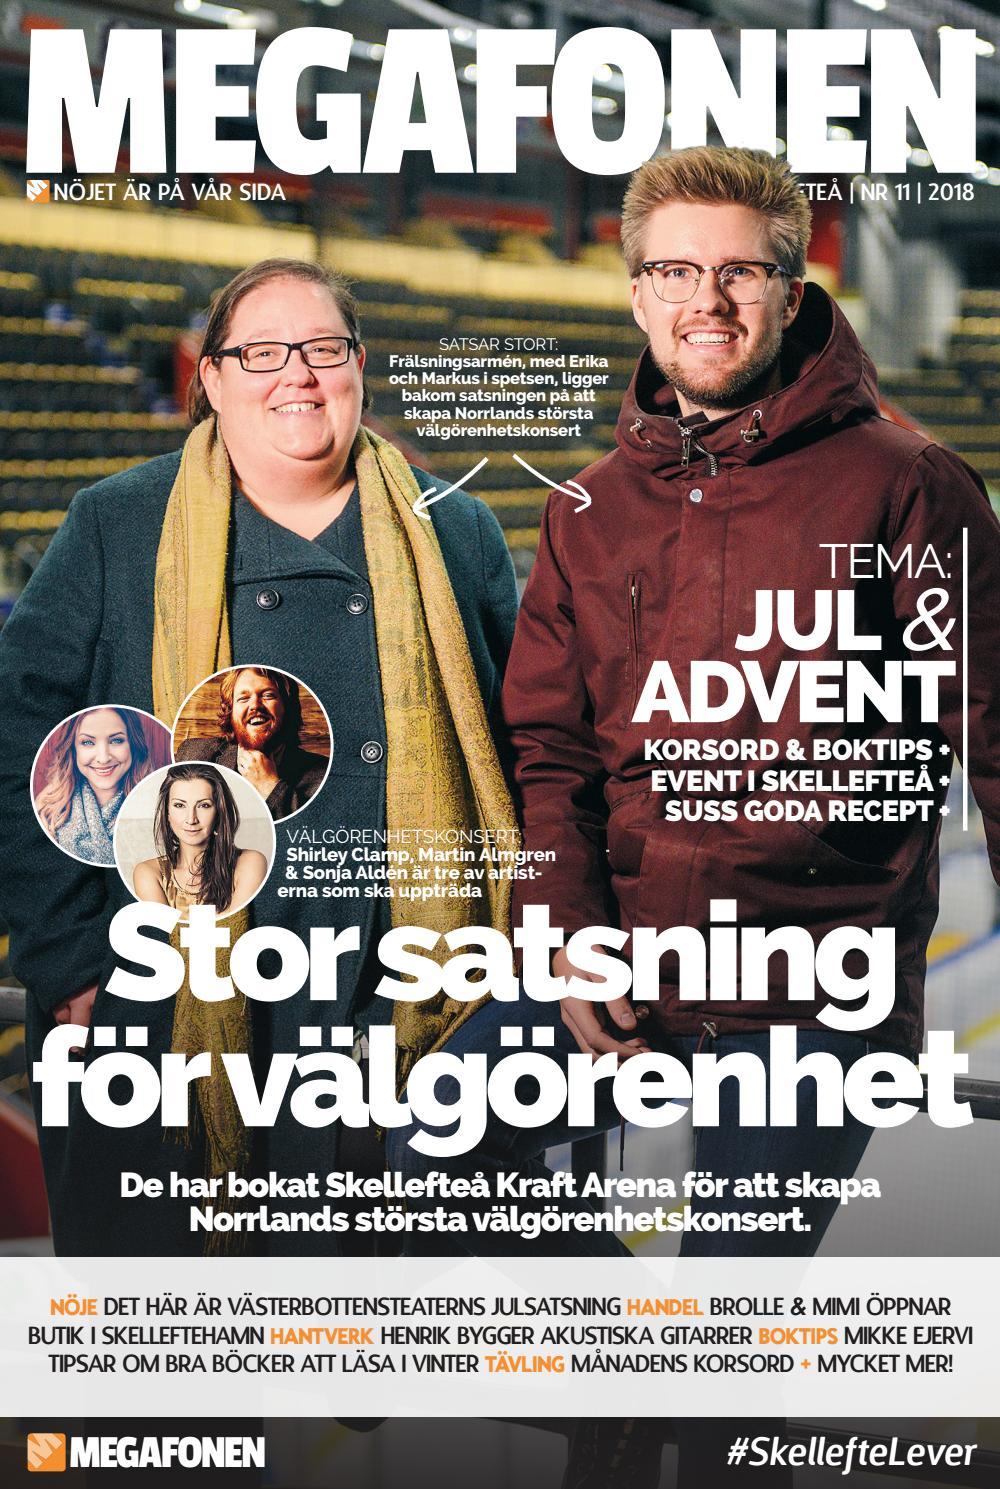 Hjortron Catering & Event AB i Skellefte